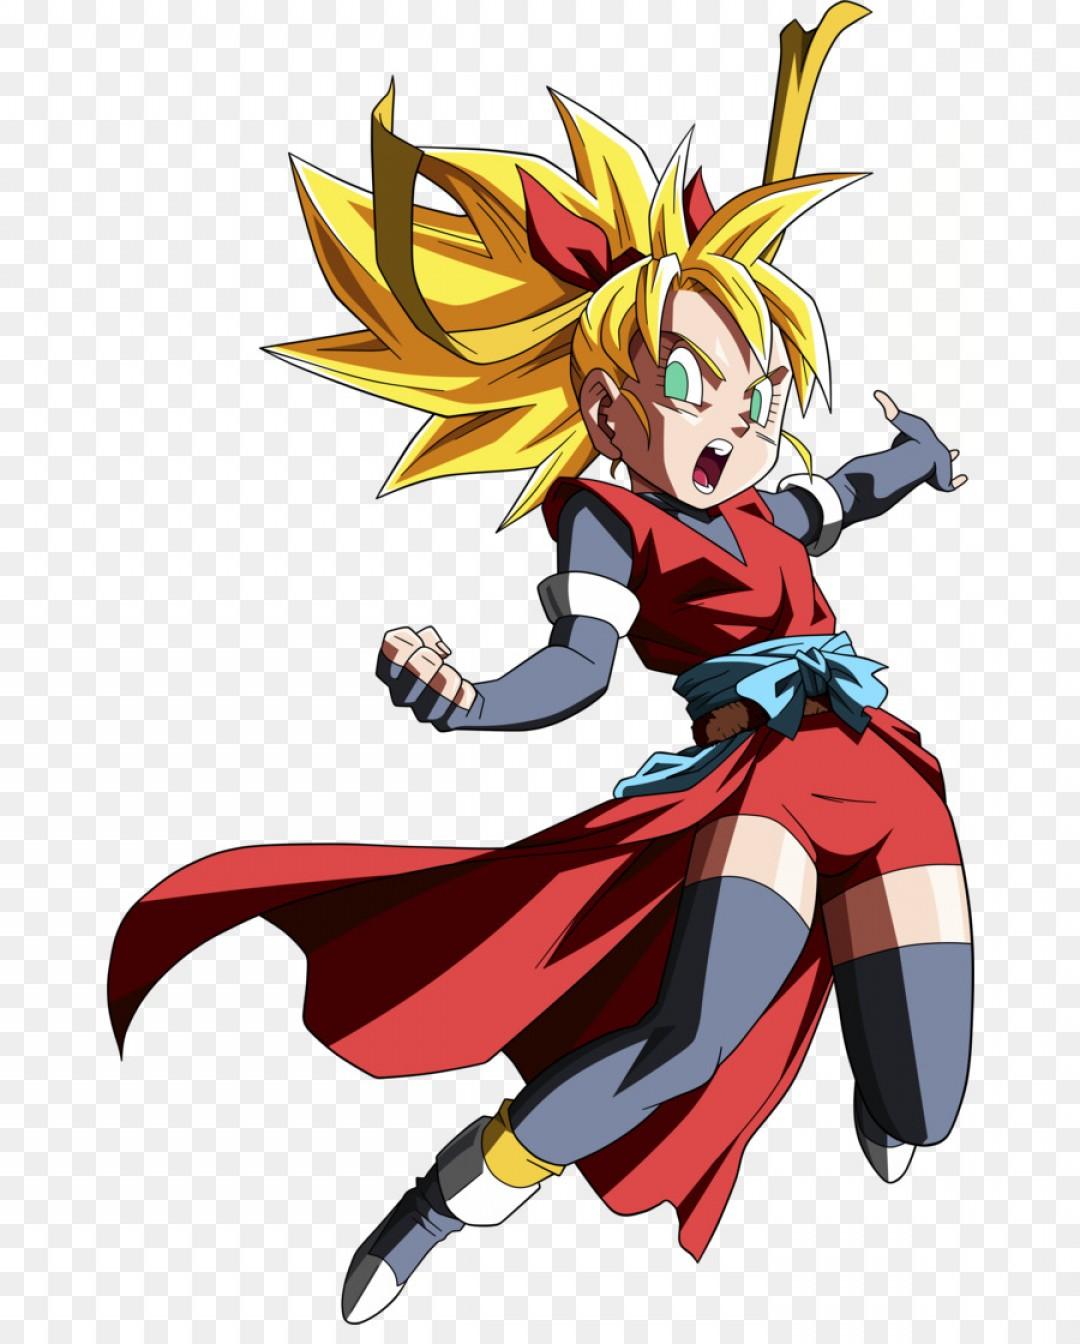 Png Super Dragon Ball Heroes Dragon Ball Z Ultimate Te.